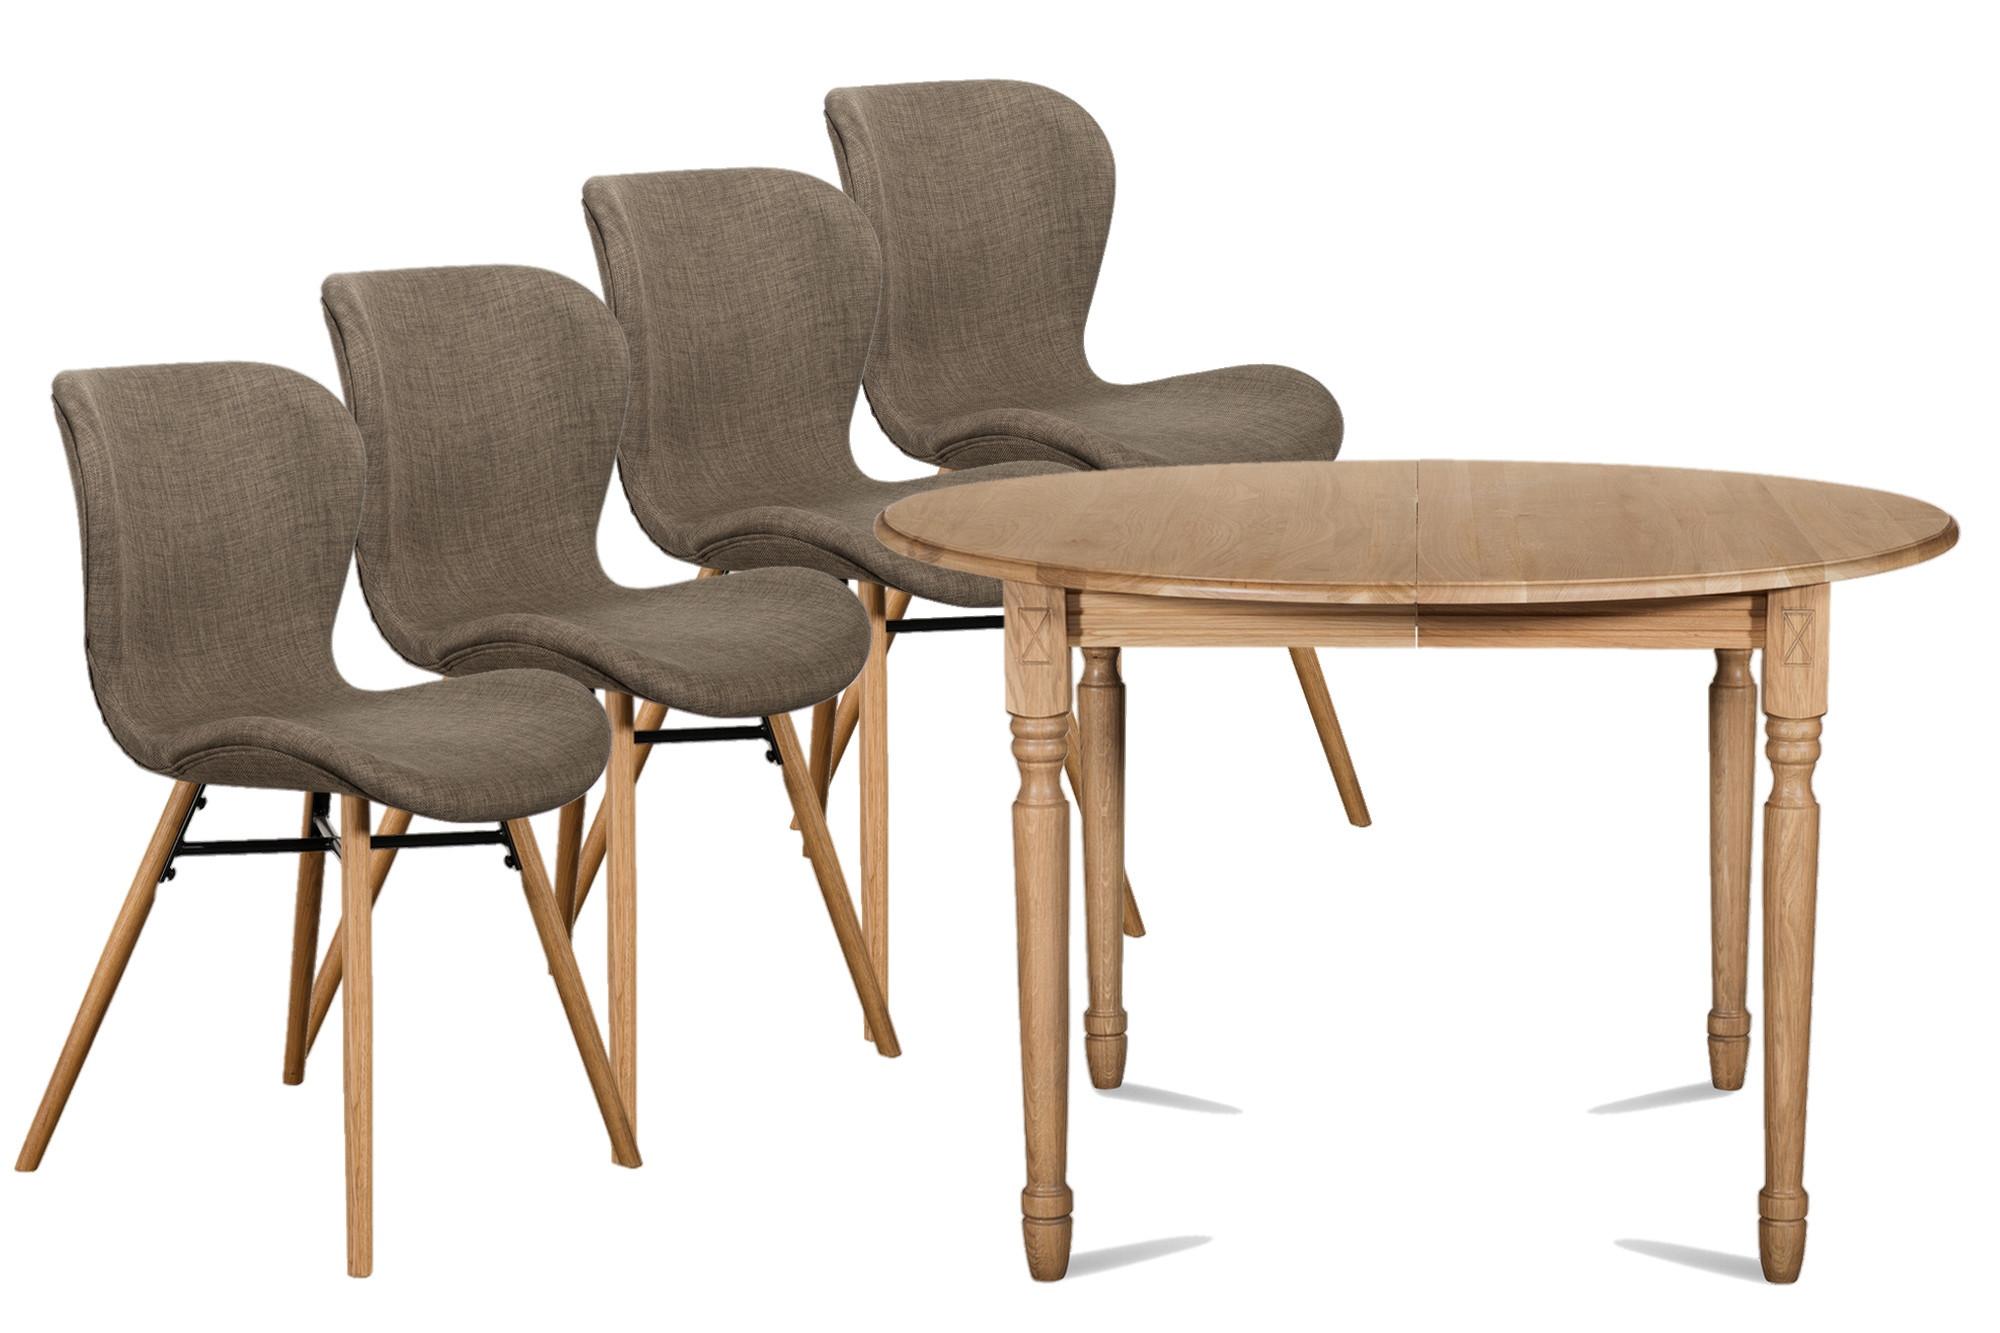 ensemble table ronde extensible victoria 4 chaises. Black Bedroom Furniture Sets. Home Design Ideas